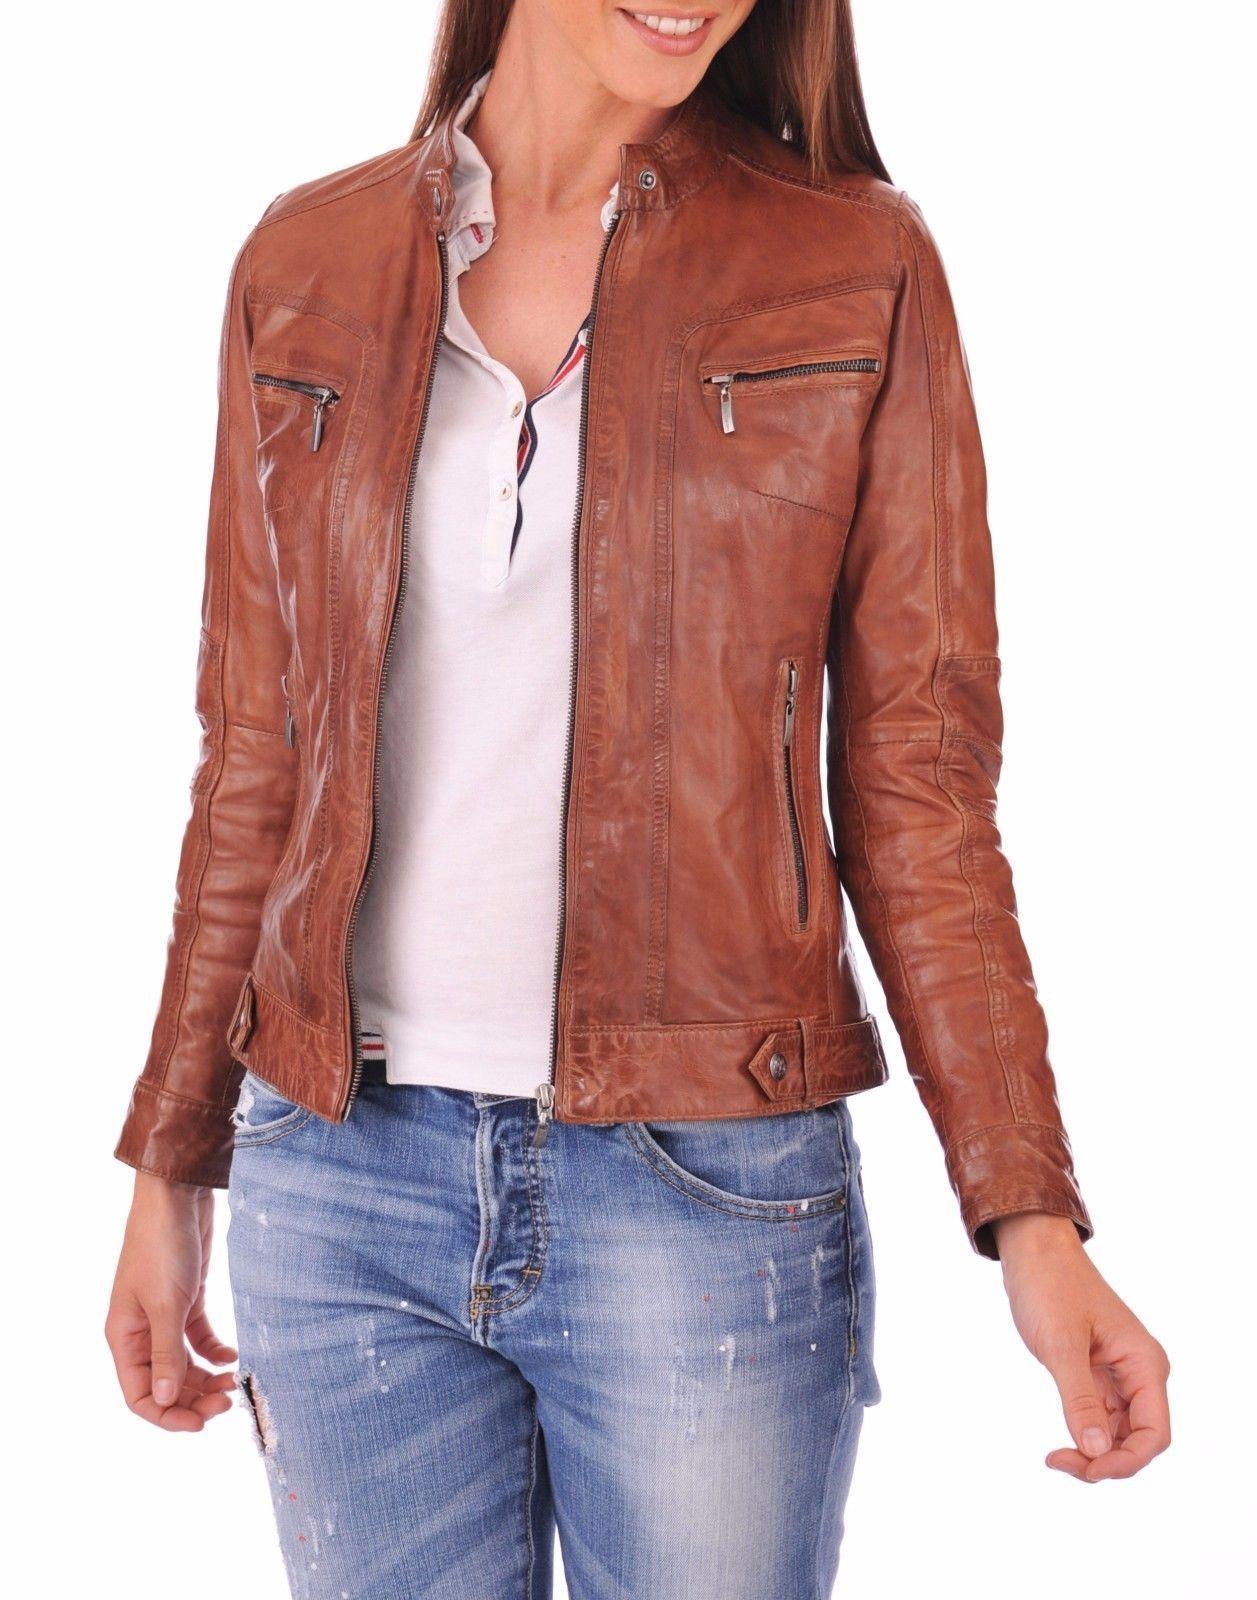 Slimfit Motorcycle Womens Leather Jacket-BNWT Victoria Beckham Biker Black